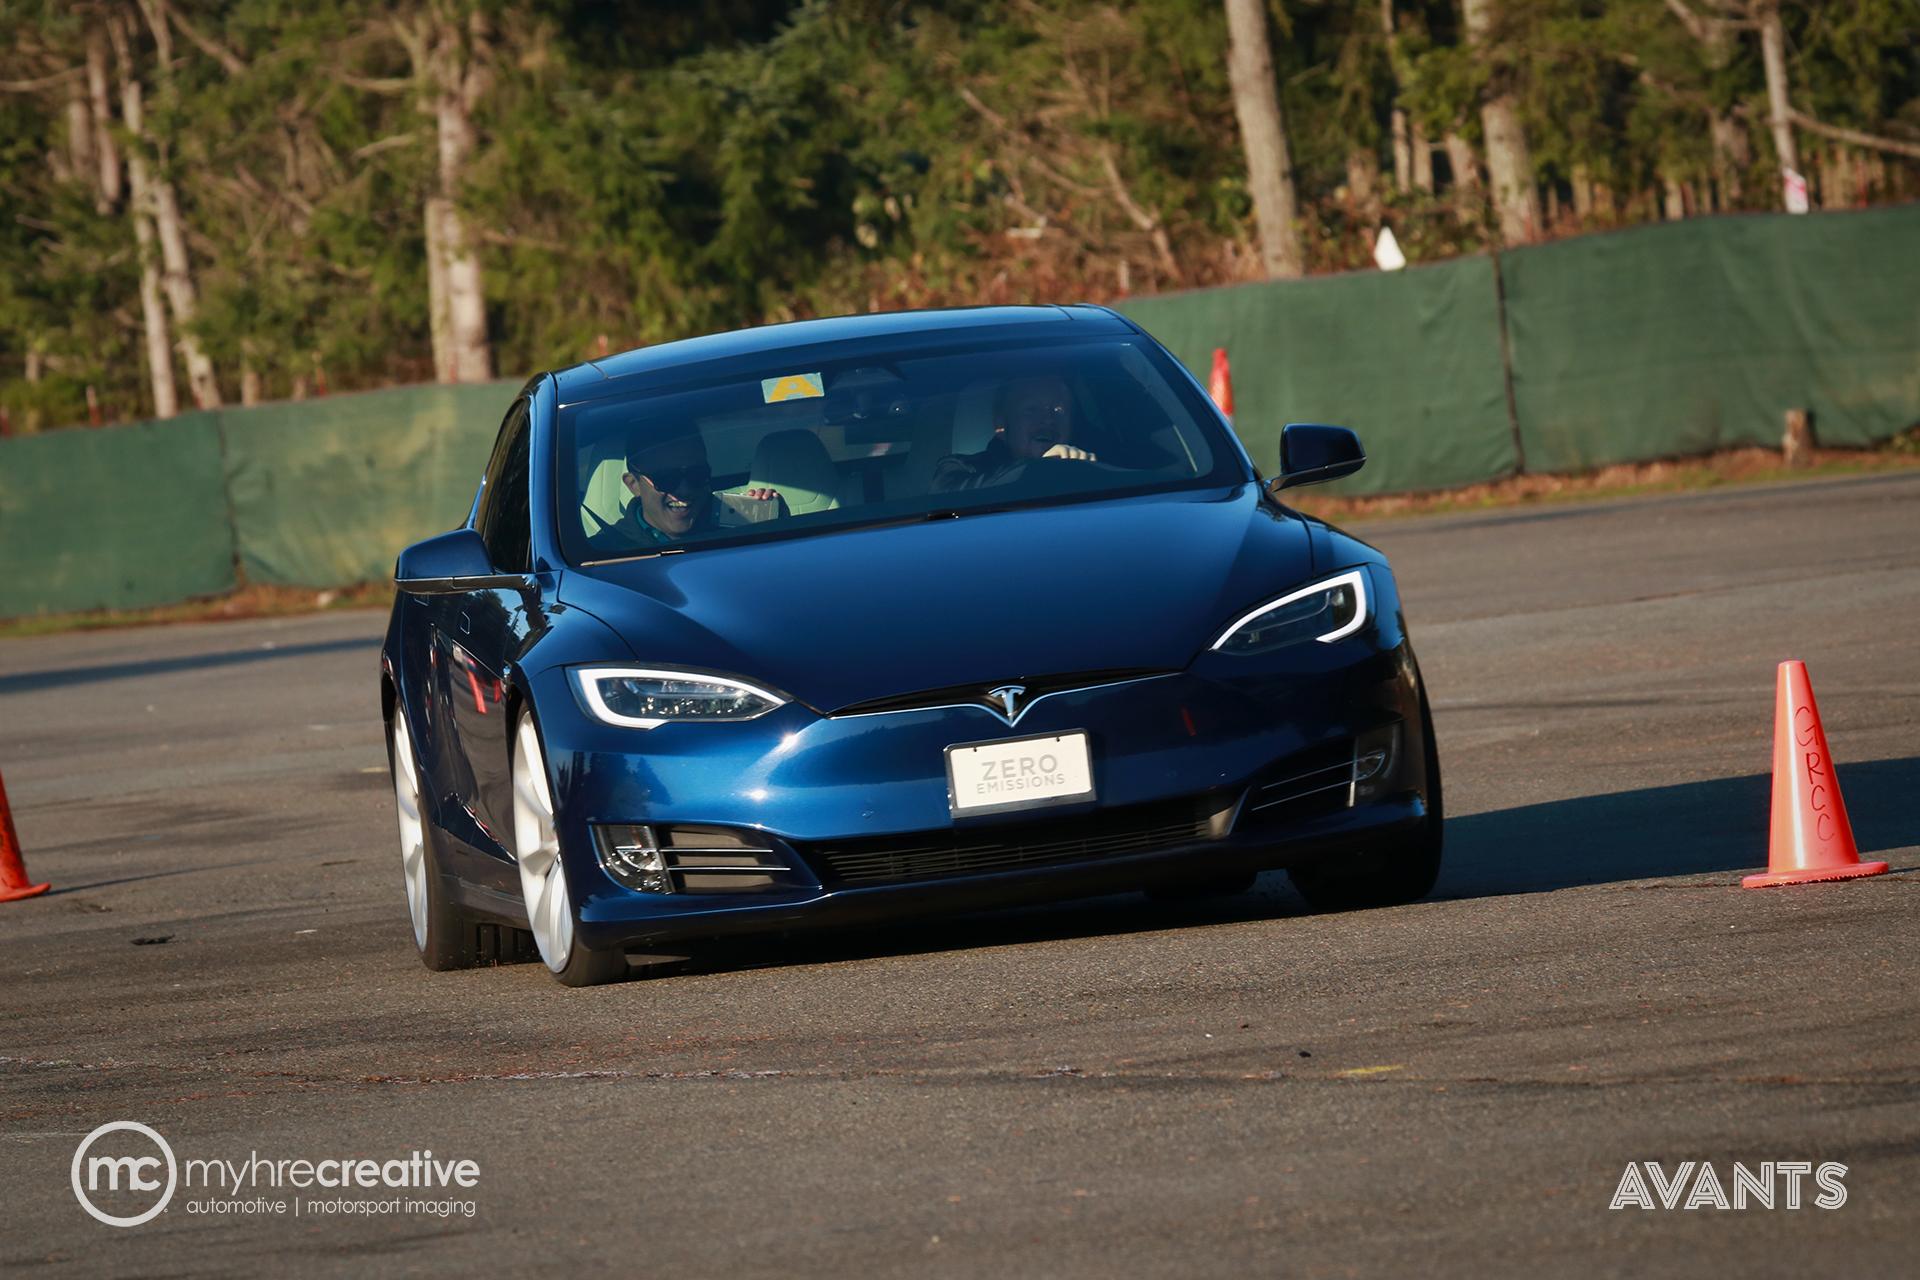 Tesla_MyhreCreative_Avants_04.jpg